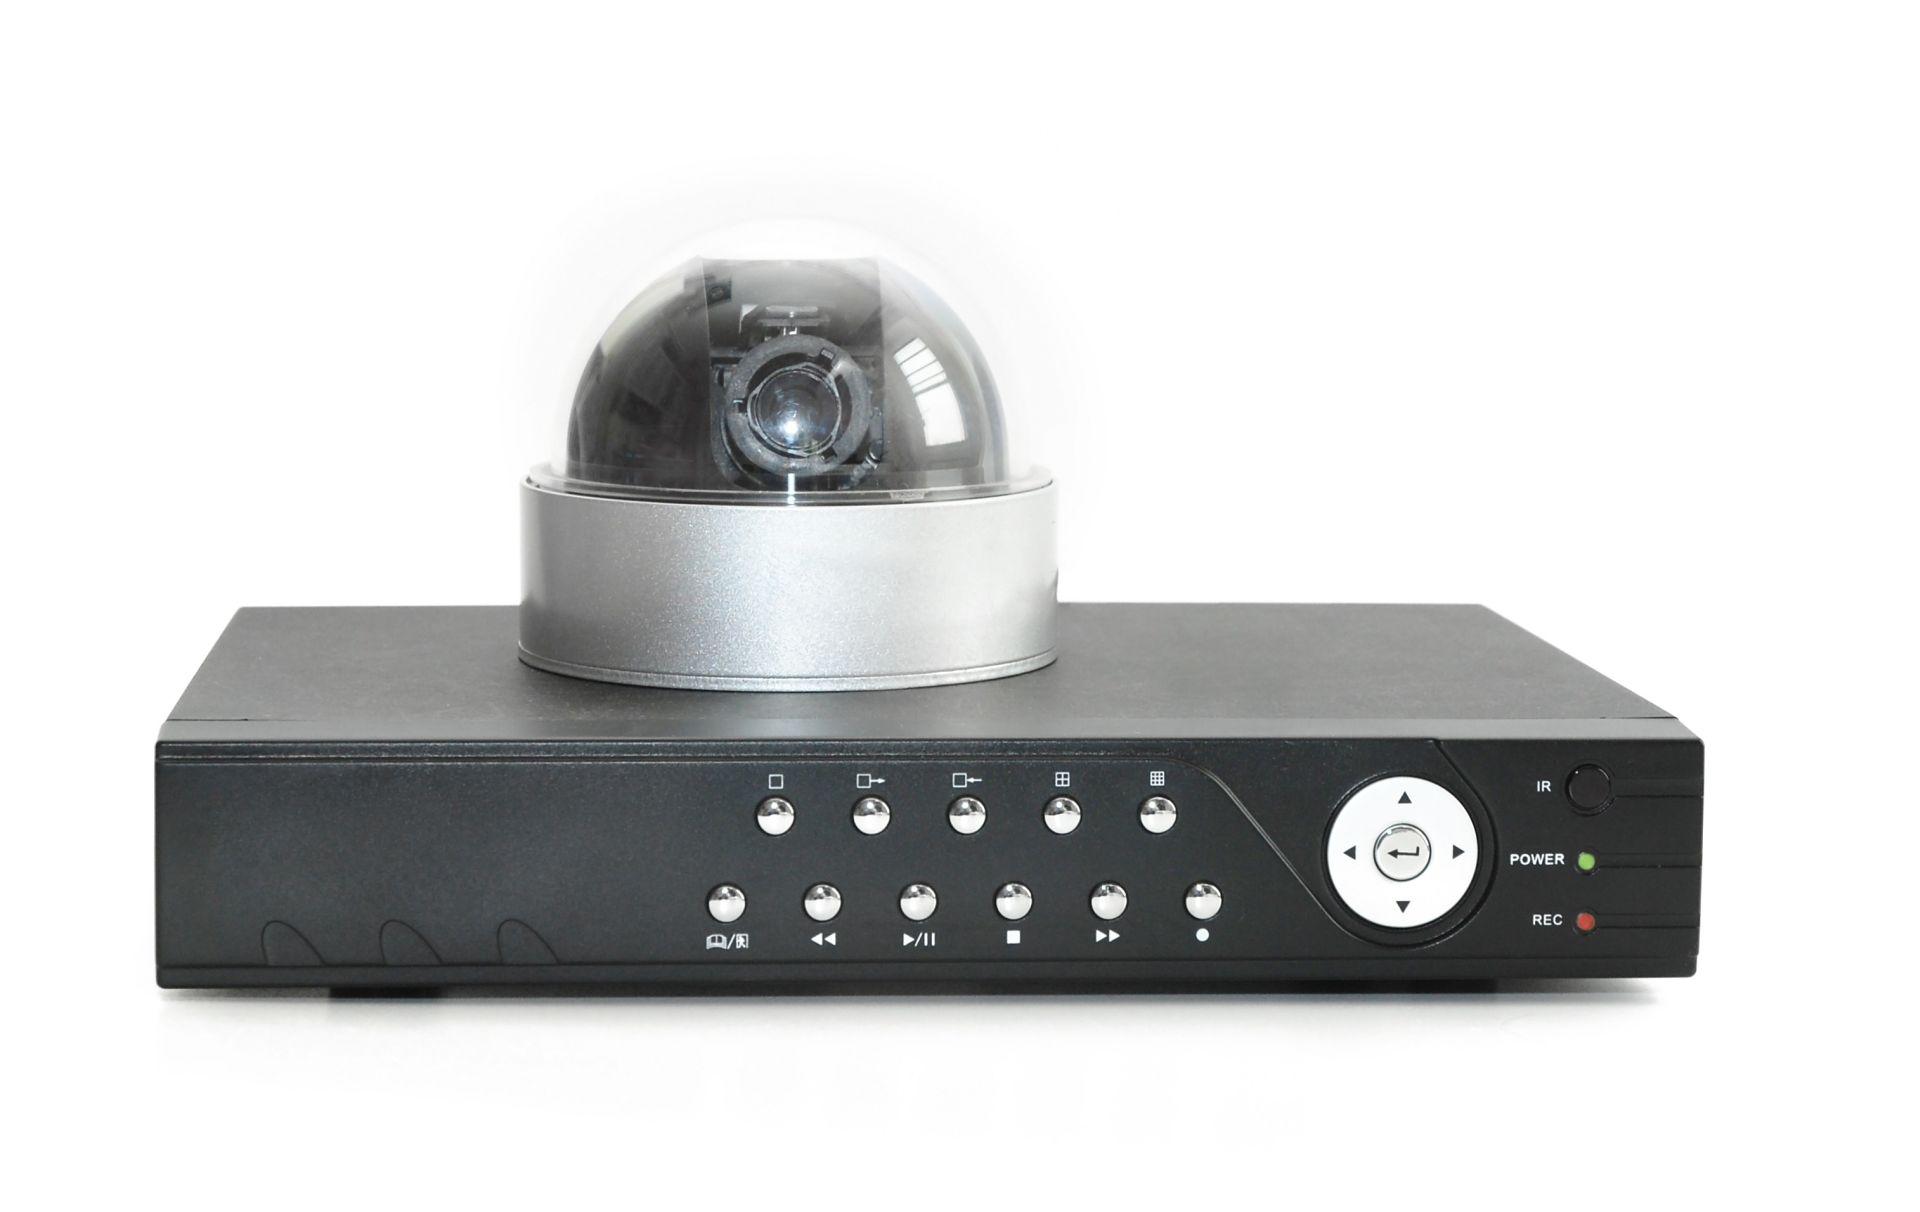 UPS Network Video Recorder NVR Applications